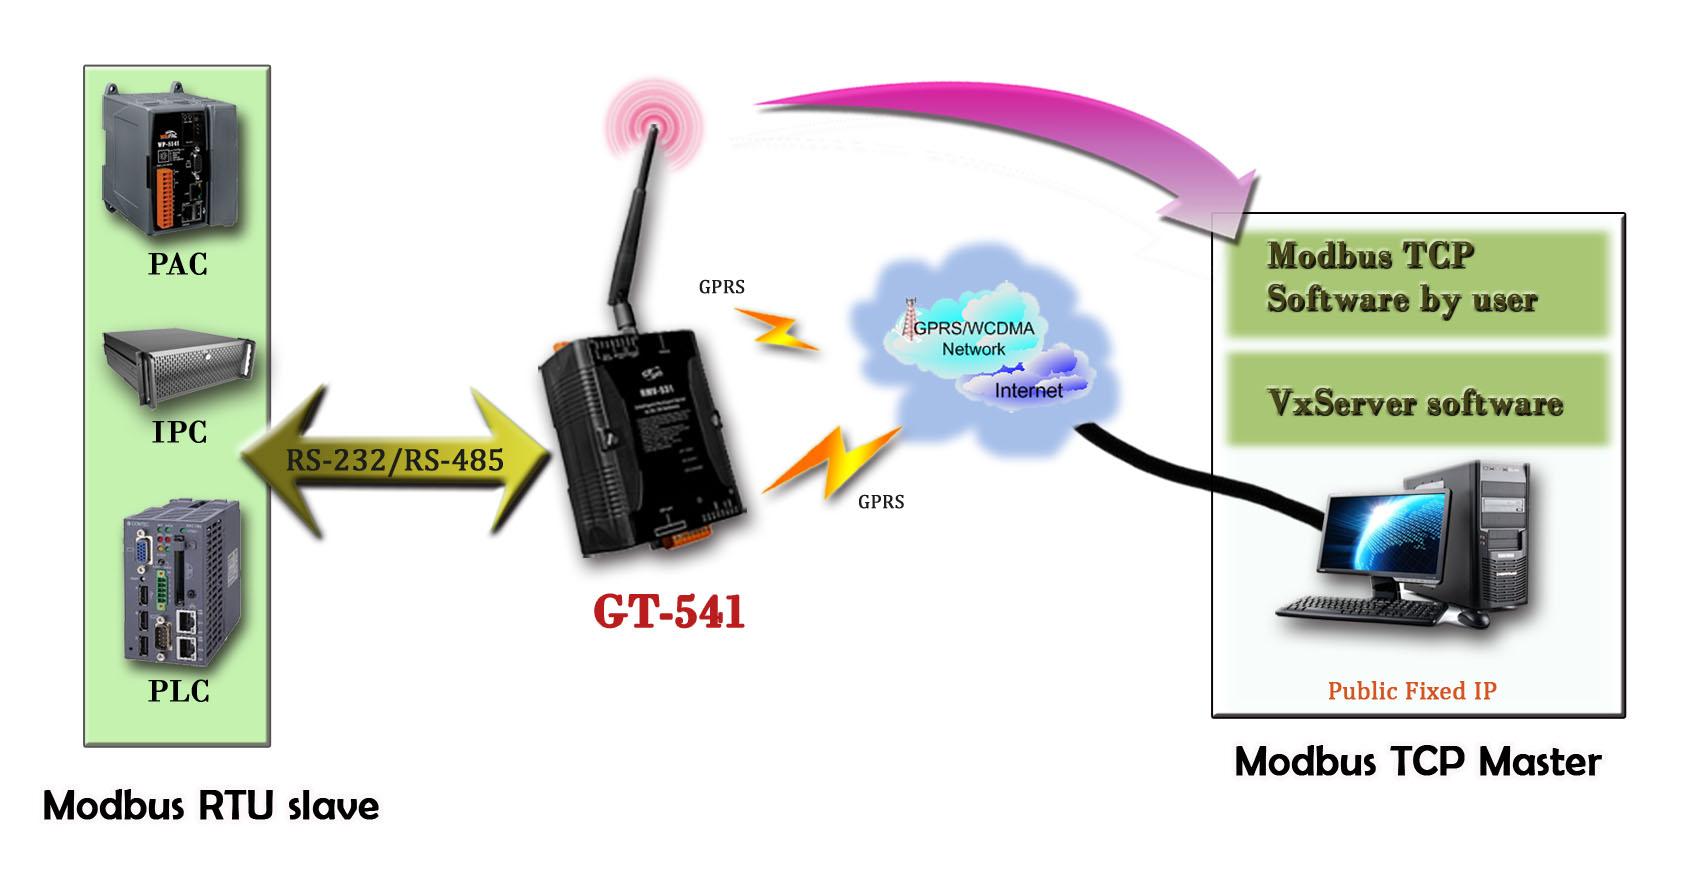 GT-541 Gateway Modbus celular serial cu GPRS si 3 porturi seriale